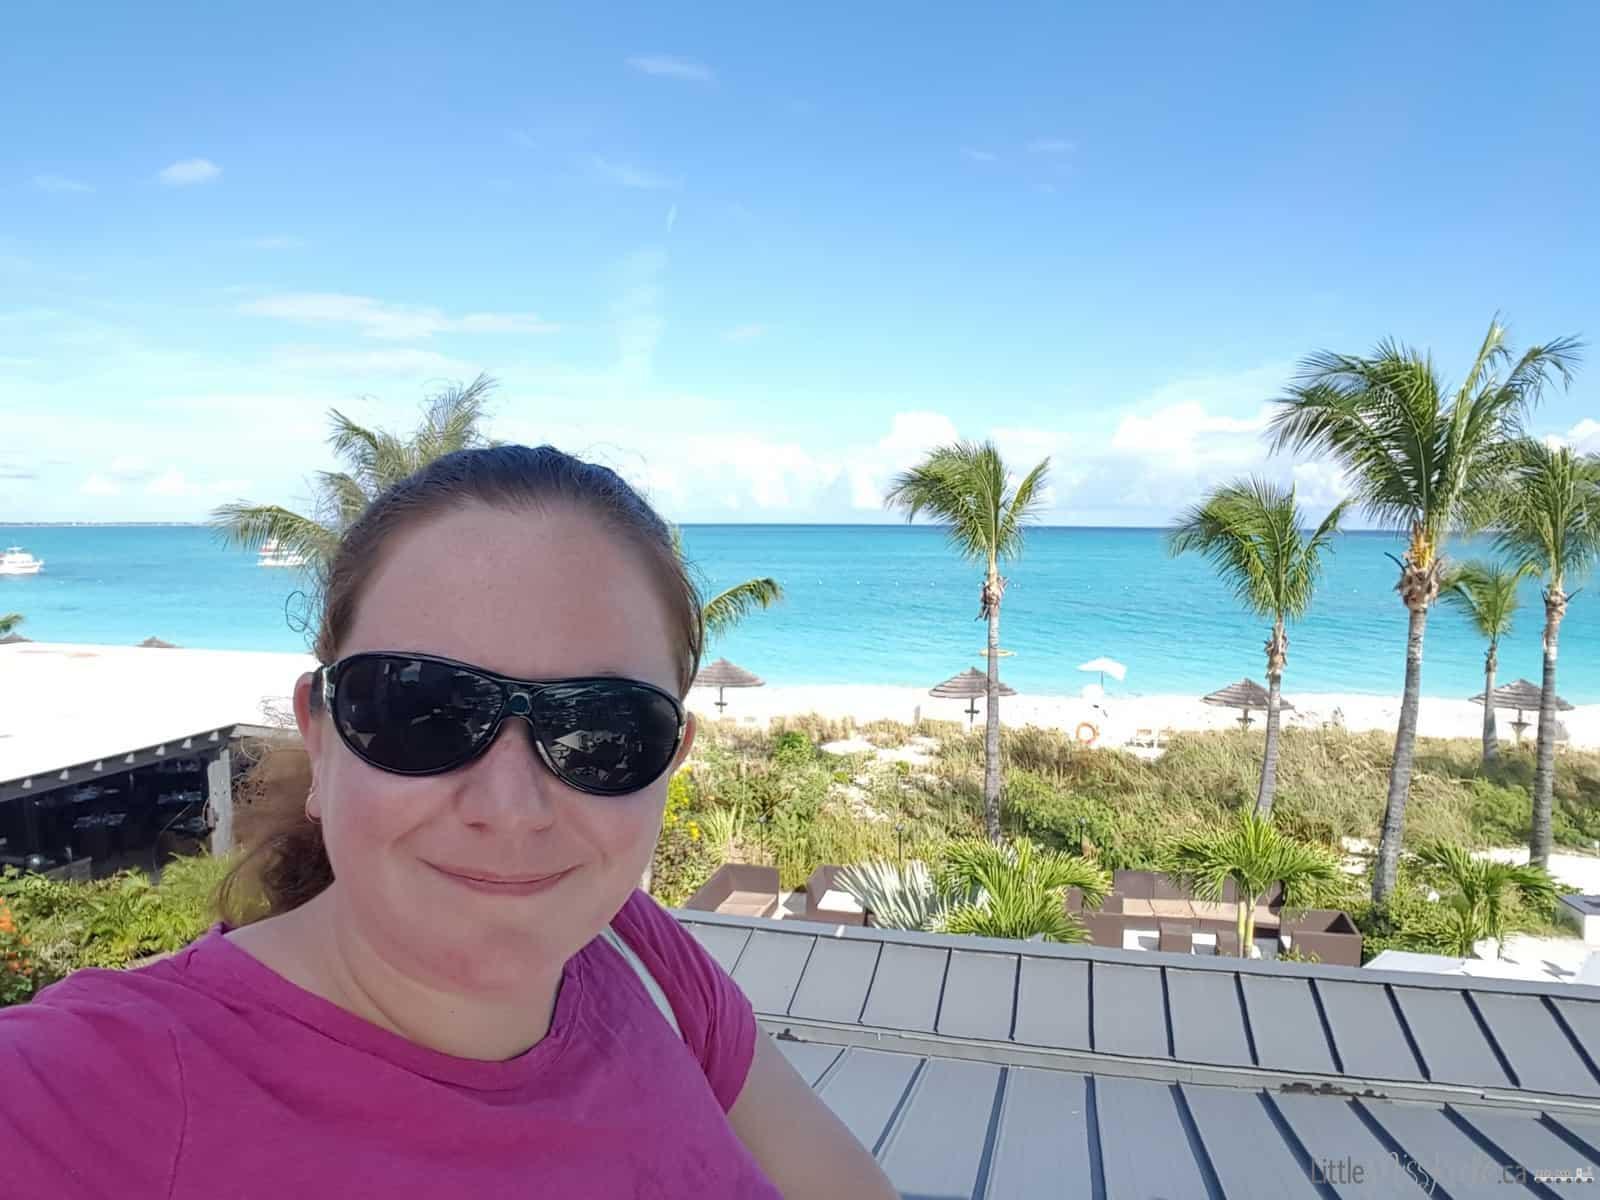 Beaches Resort Villages Turks and Caicos Restaurants - Sky via littlemisskate.ca